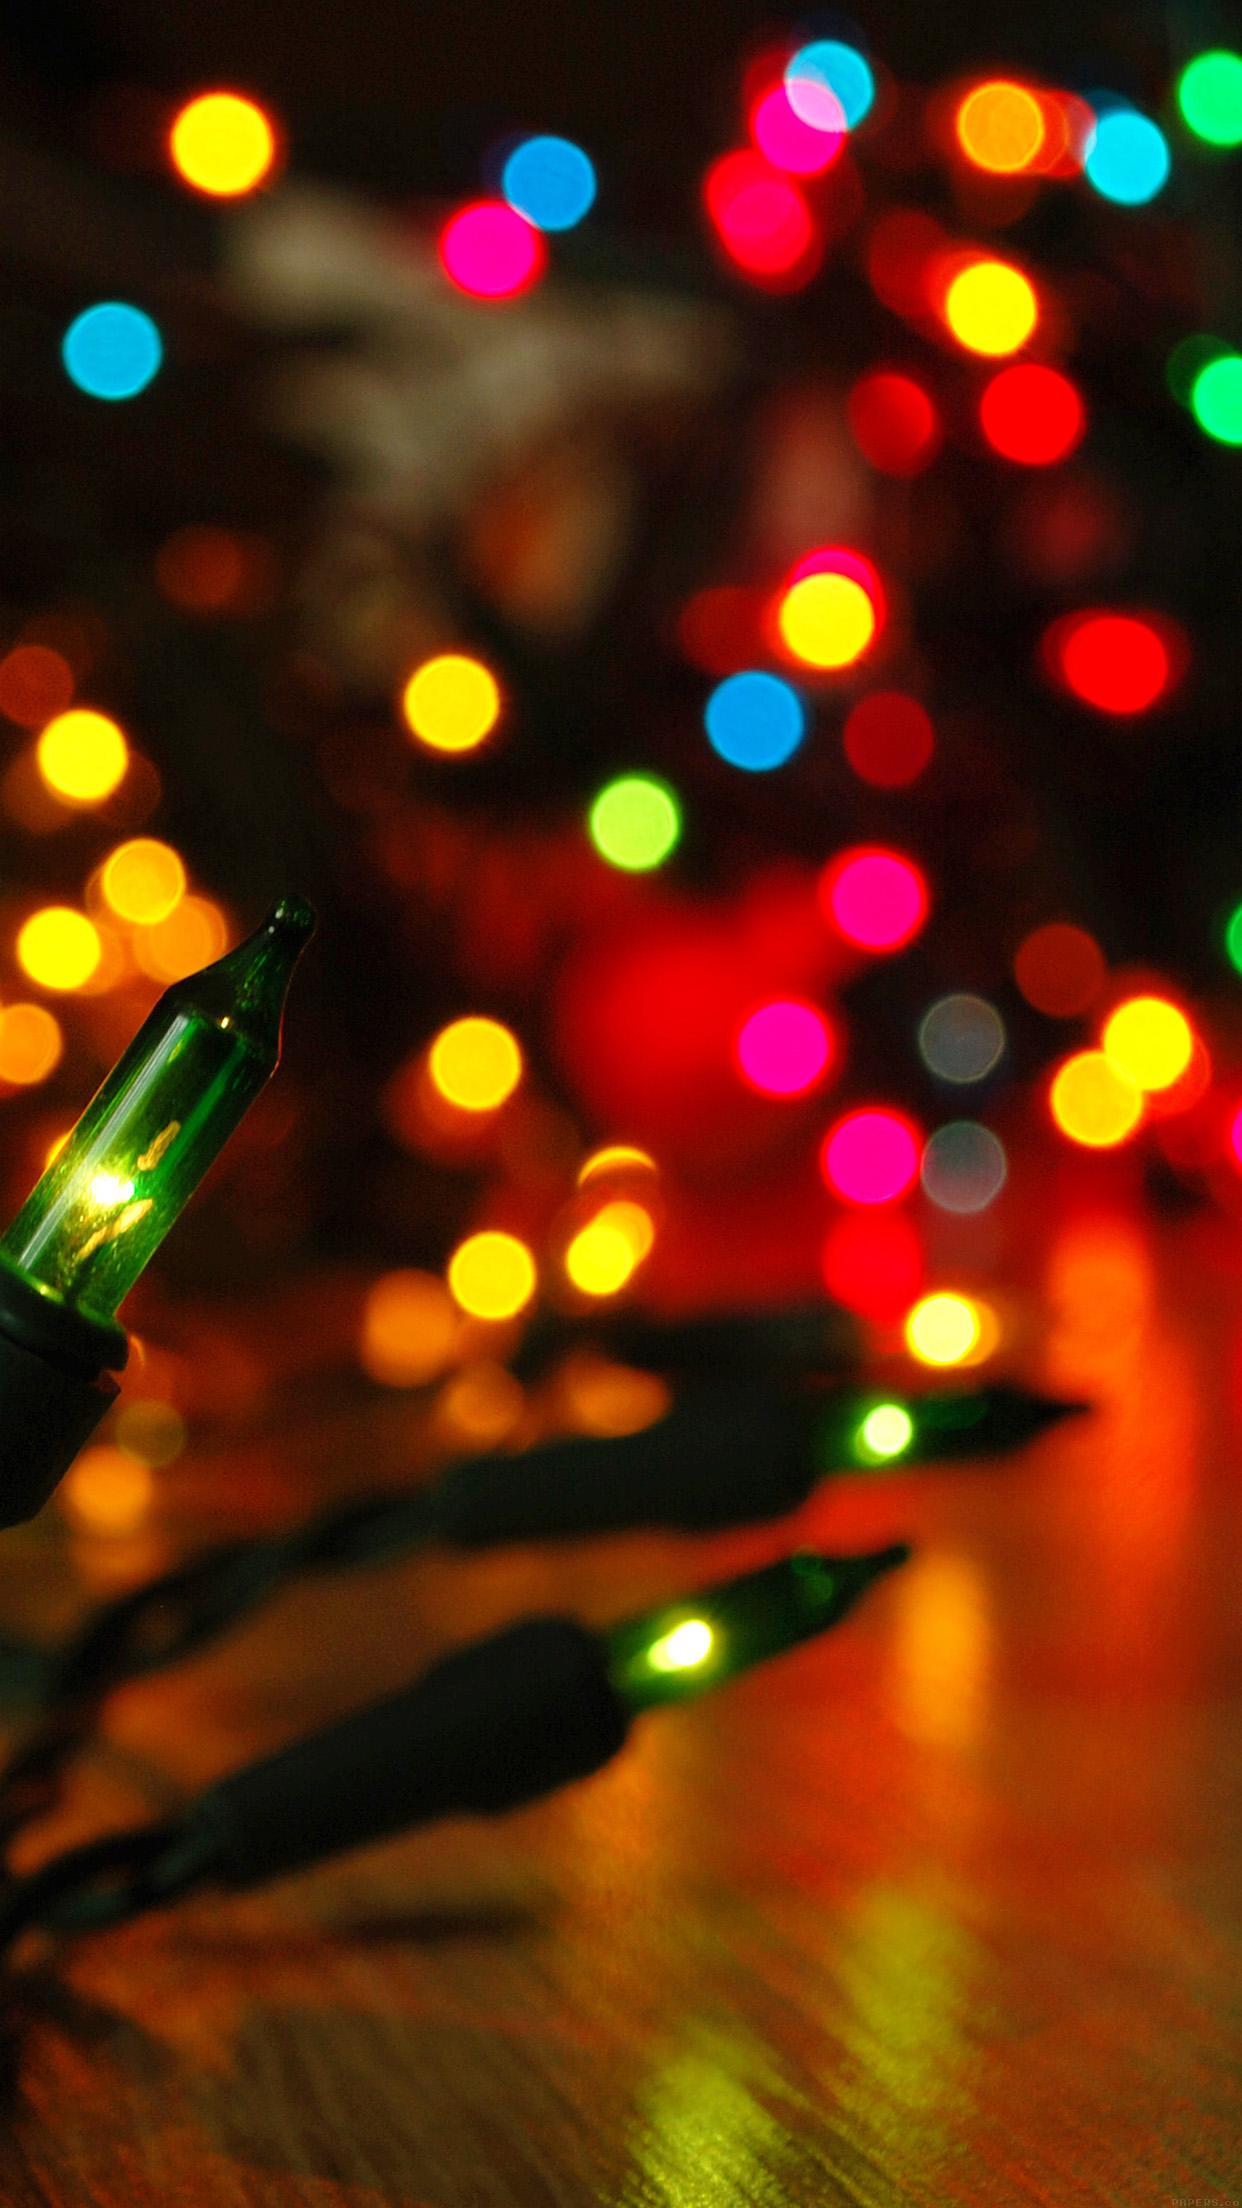 christmas lights bokeh iphone 6s plus wallpaper